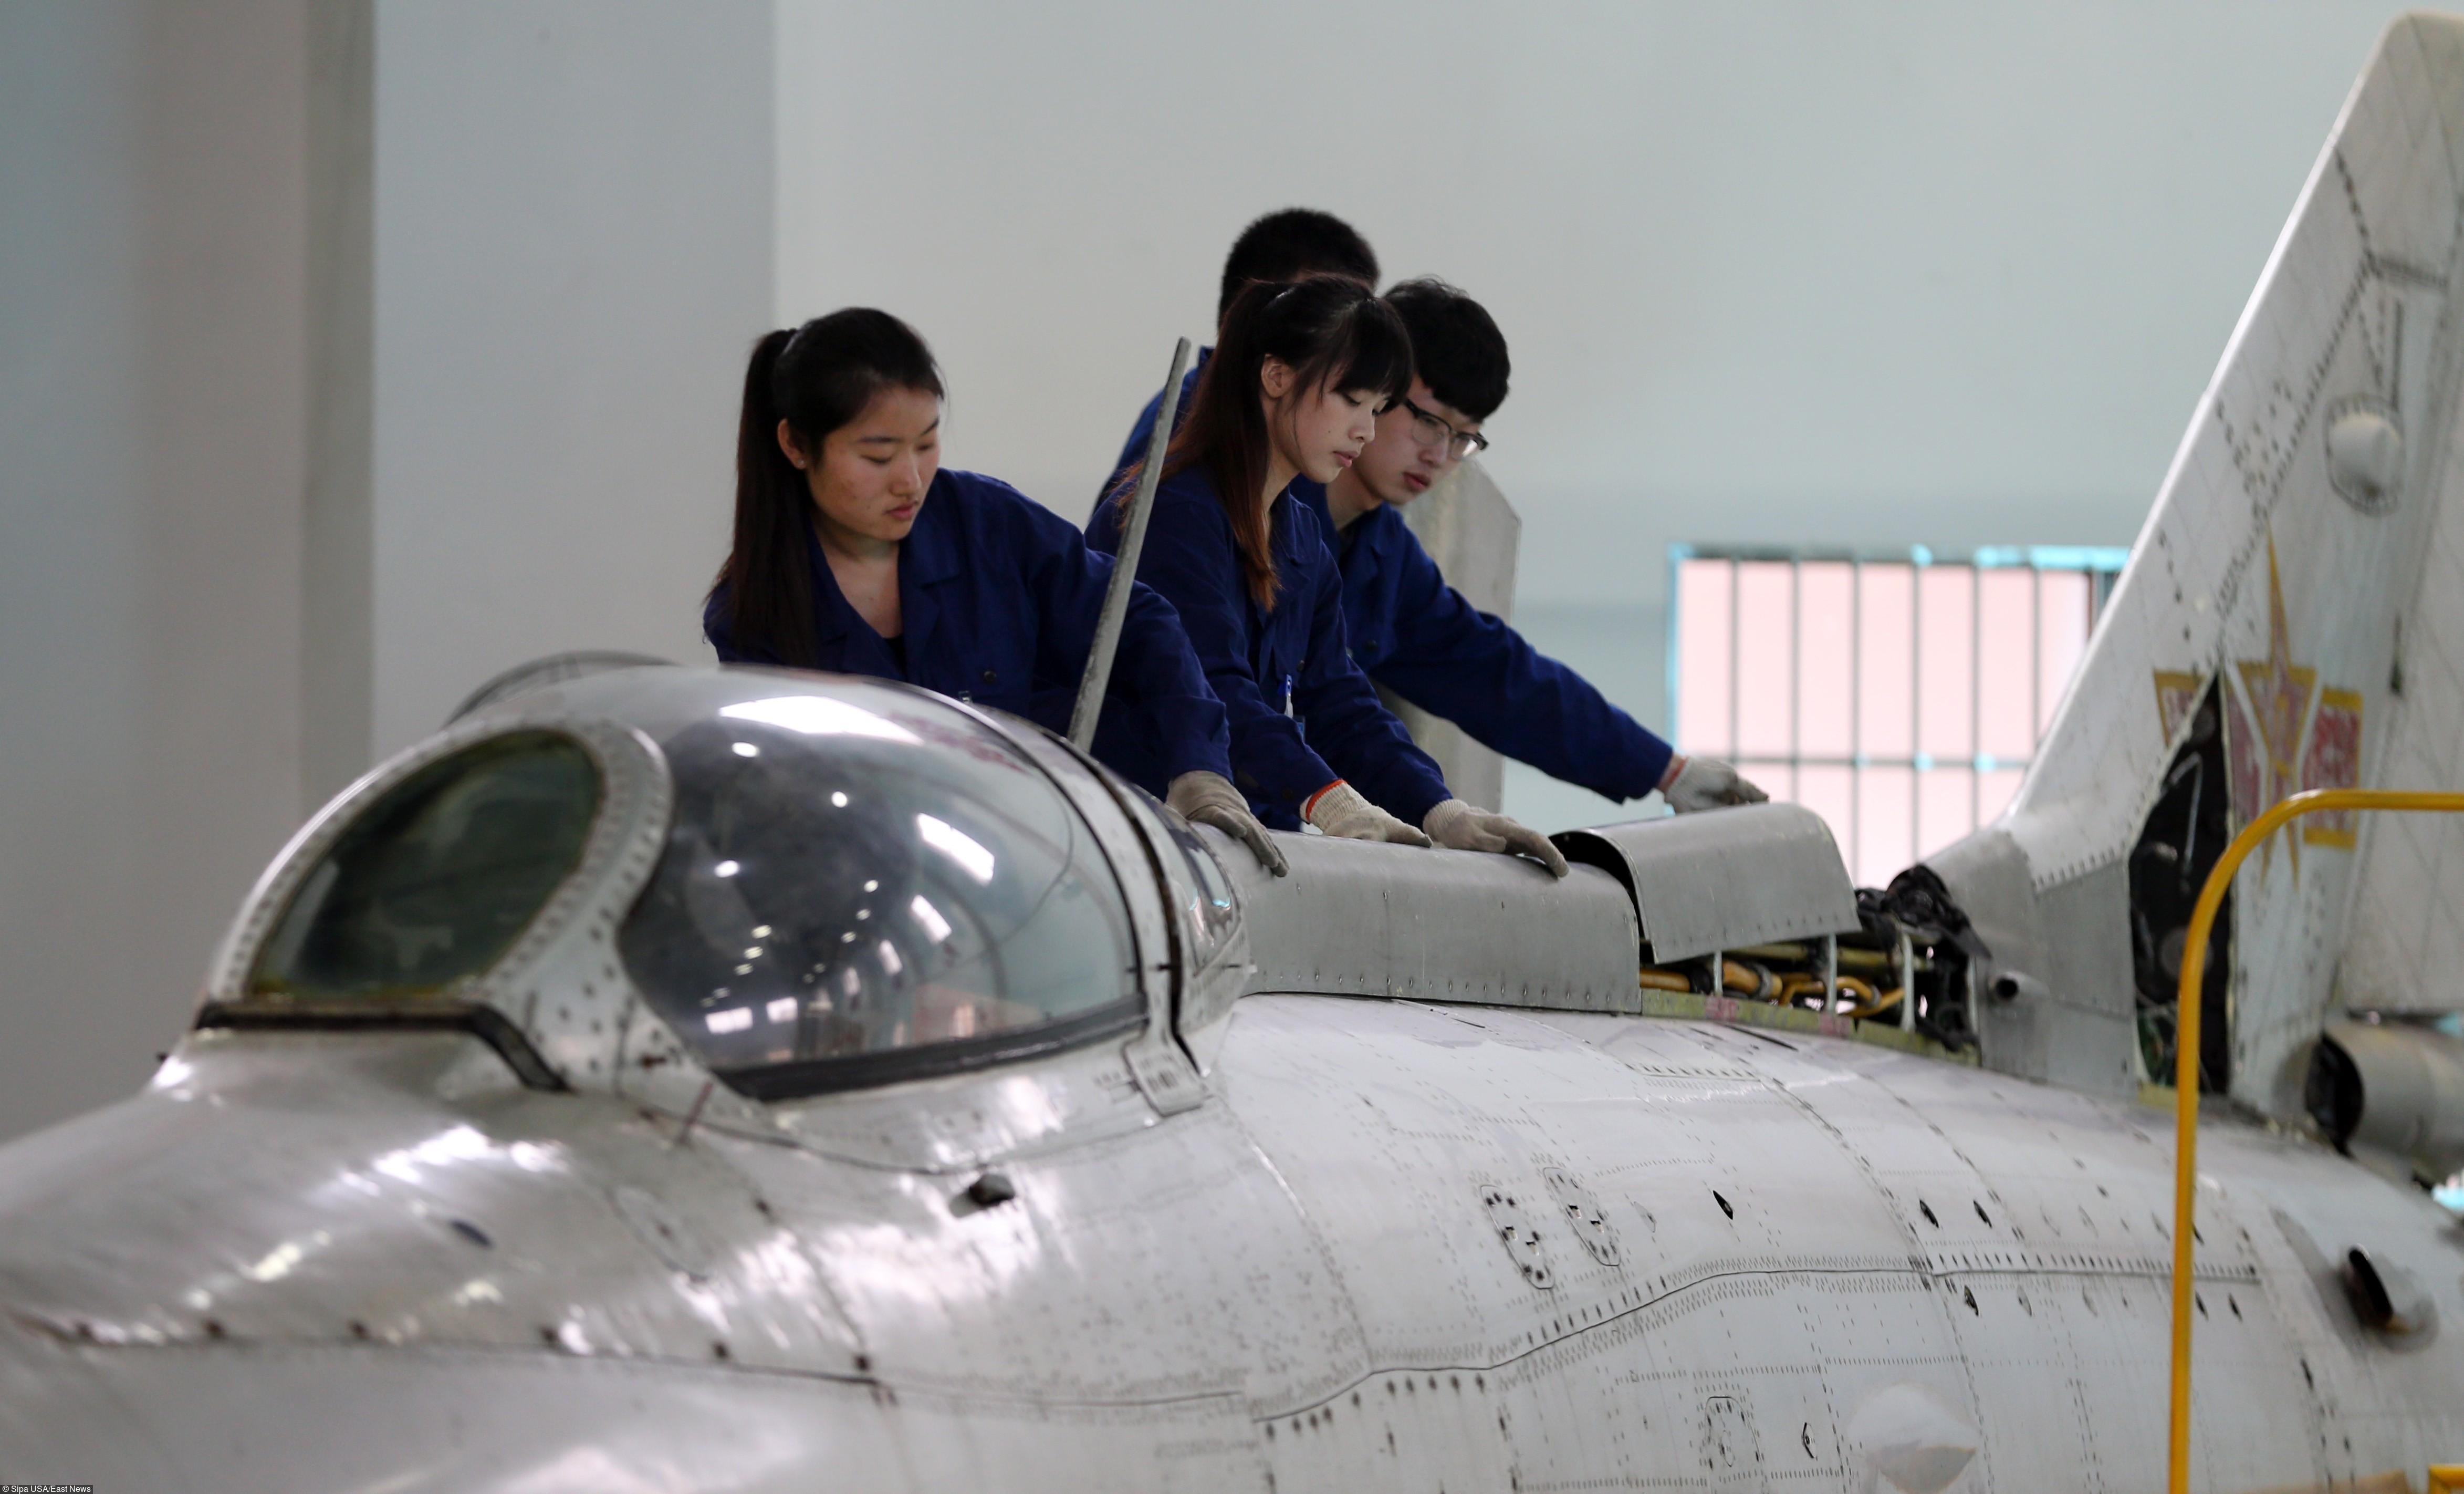 <p><span>Фото: &copy; Xinhua/Sipa USA/East News</span></p>